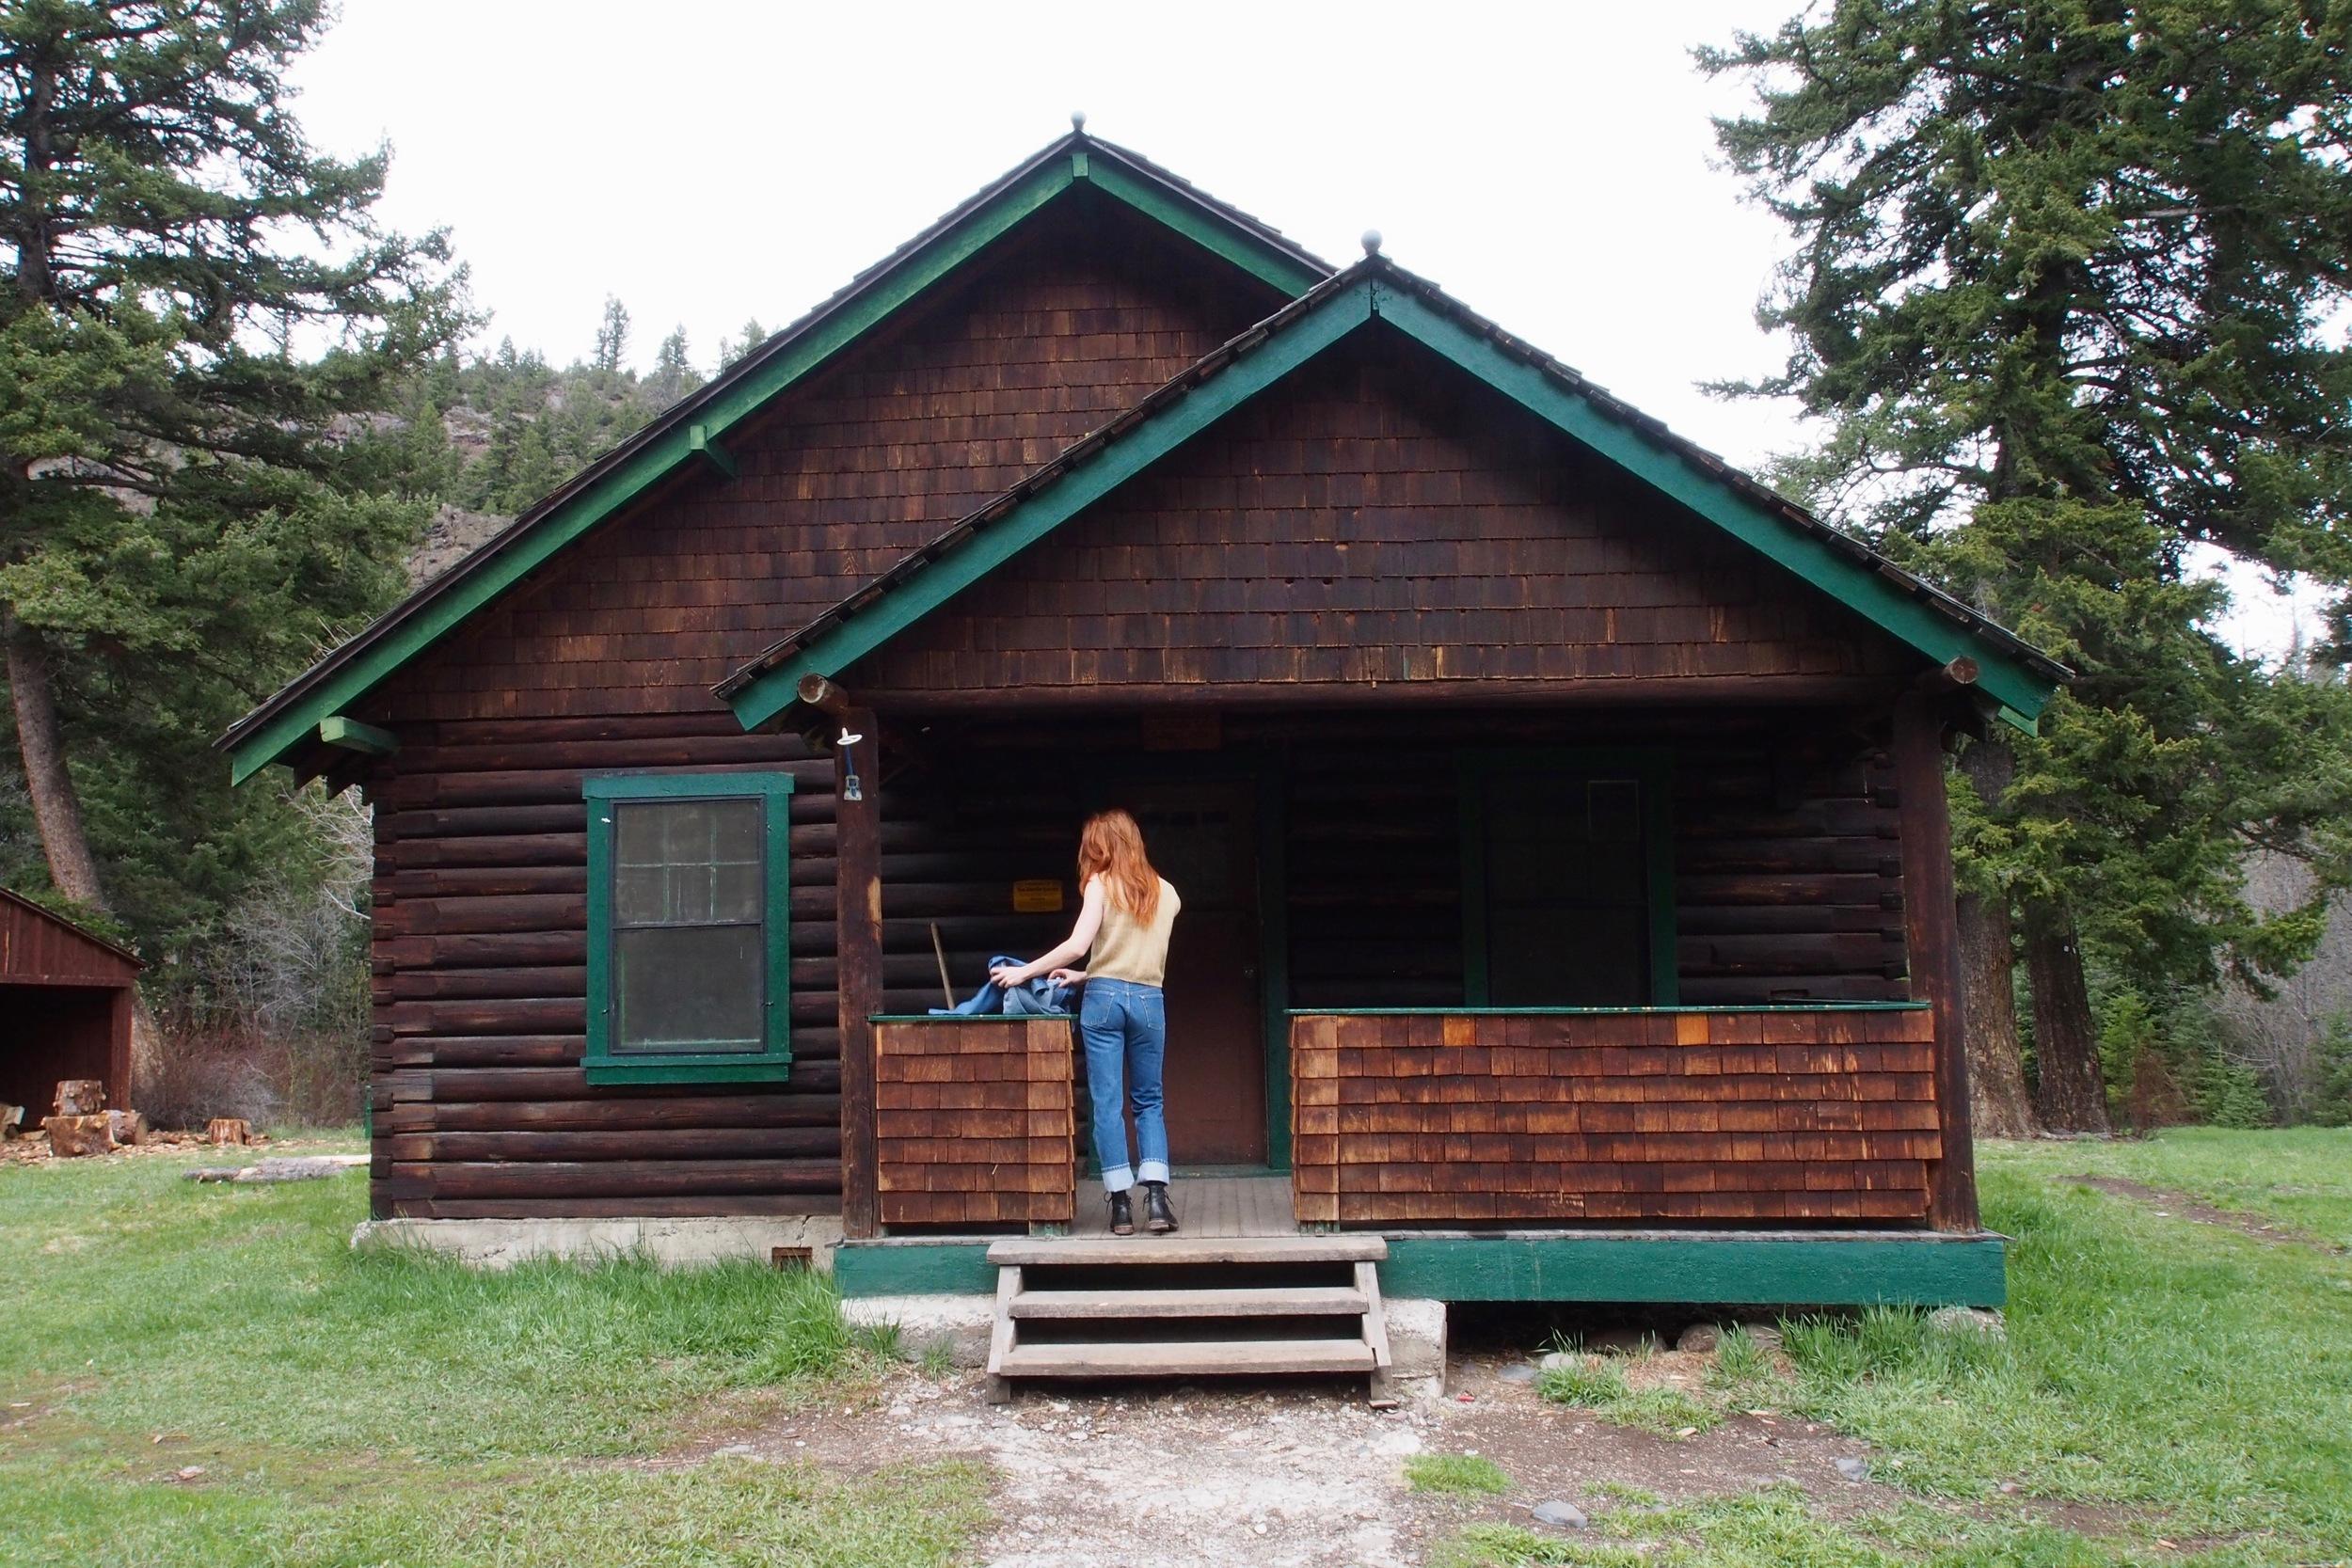 Big Creek Forest Service Cabin